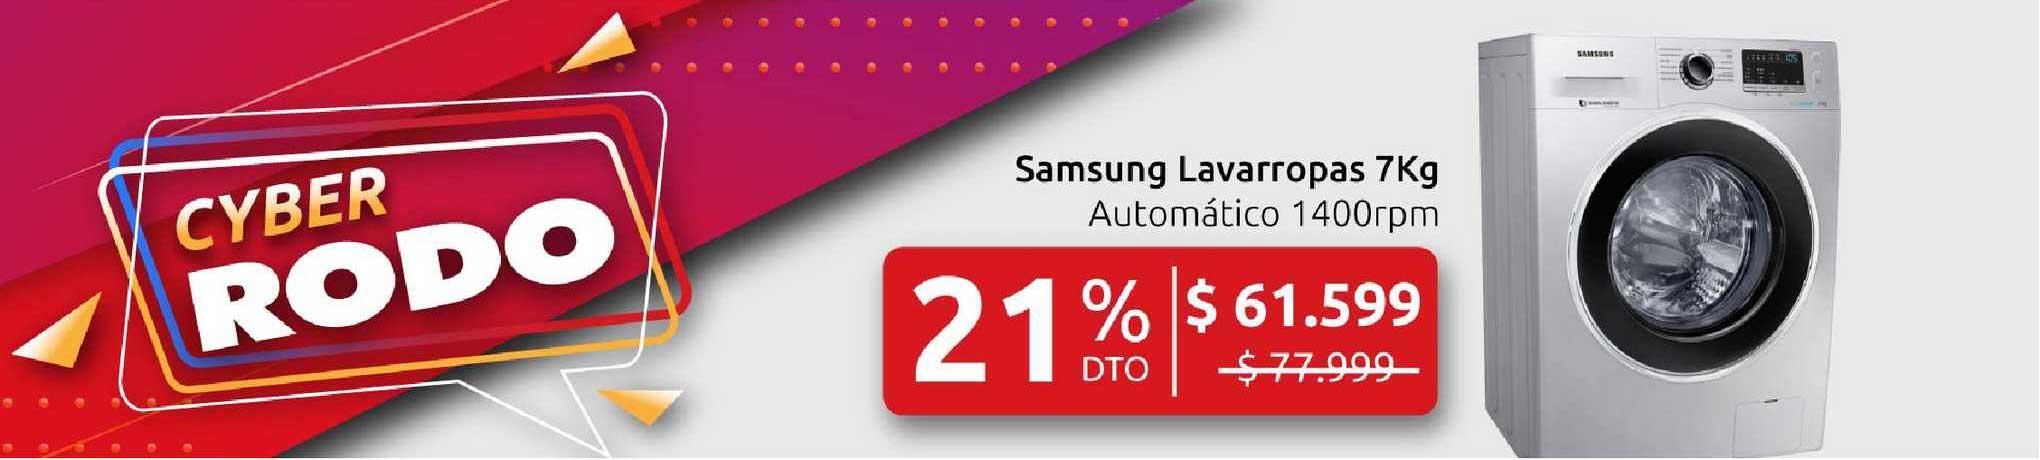 Rodo Samsung Lavarropas 7Kg Automático 1400rpm